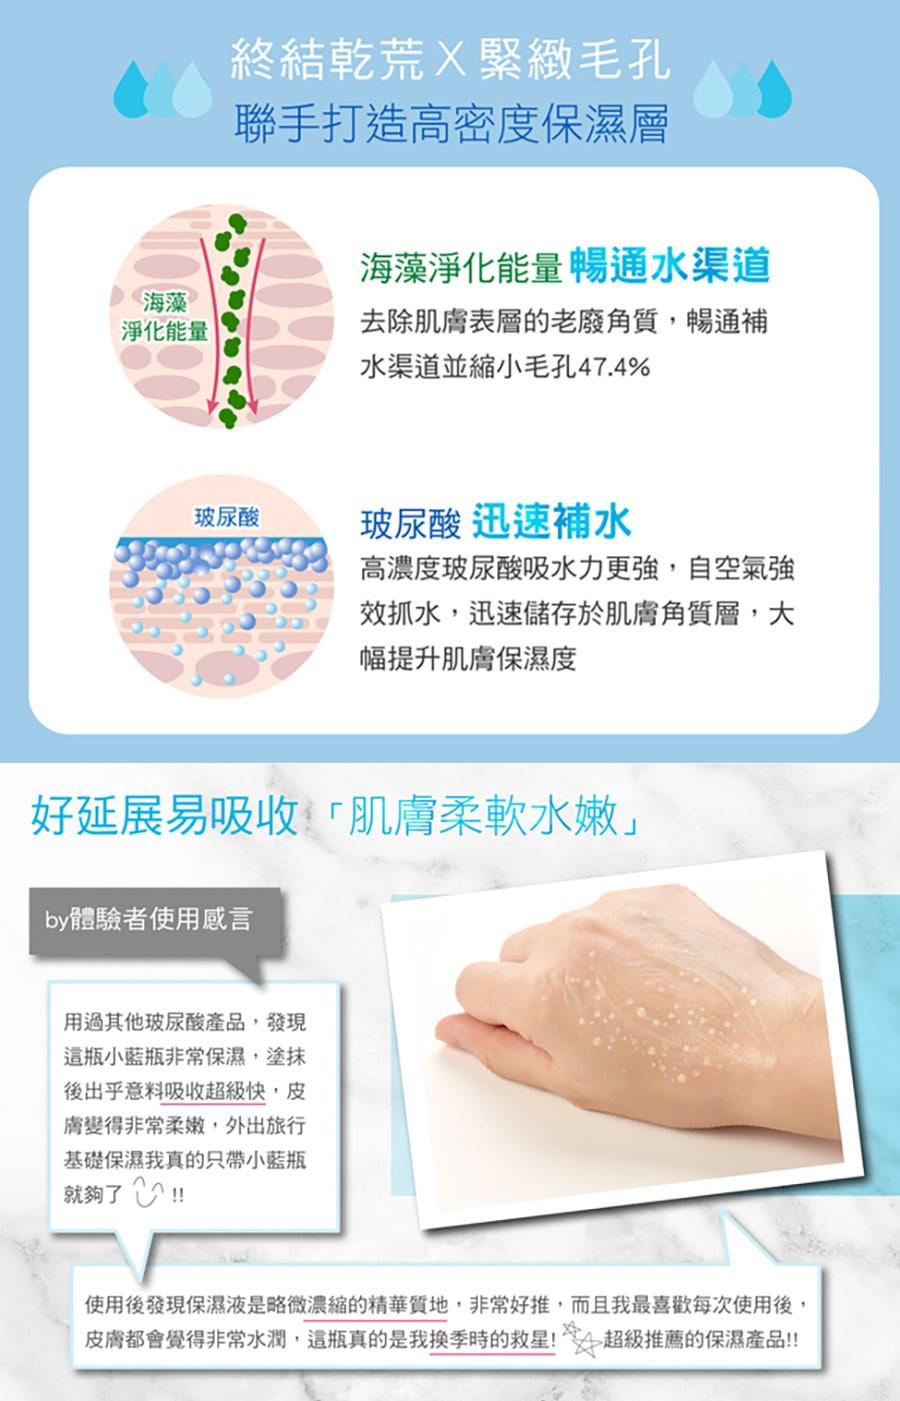 Aqua Skin-Dewy Lotion - Benefits